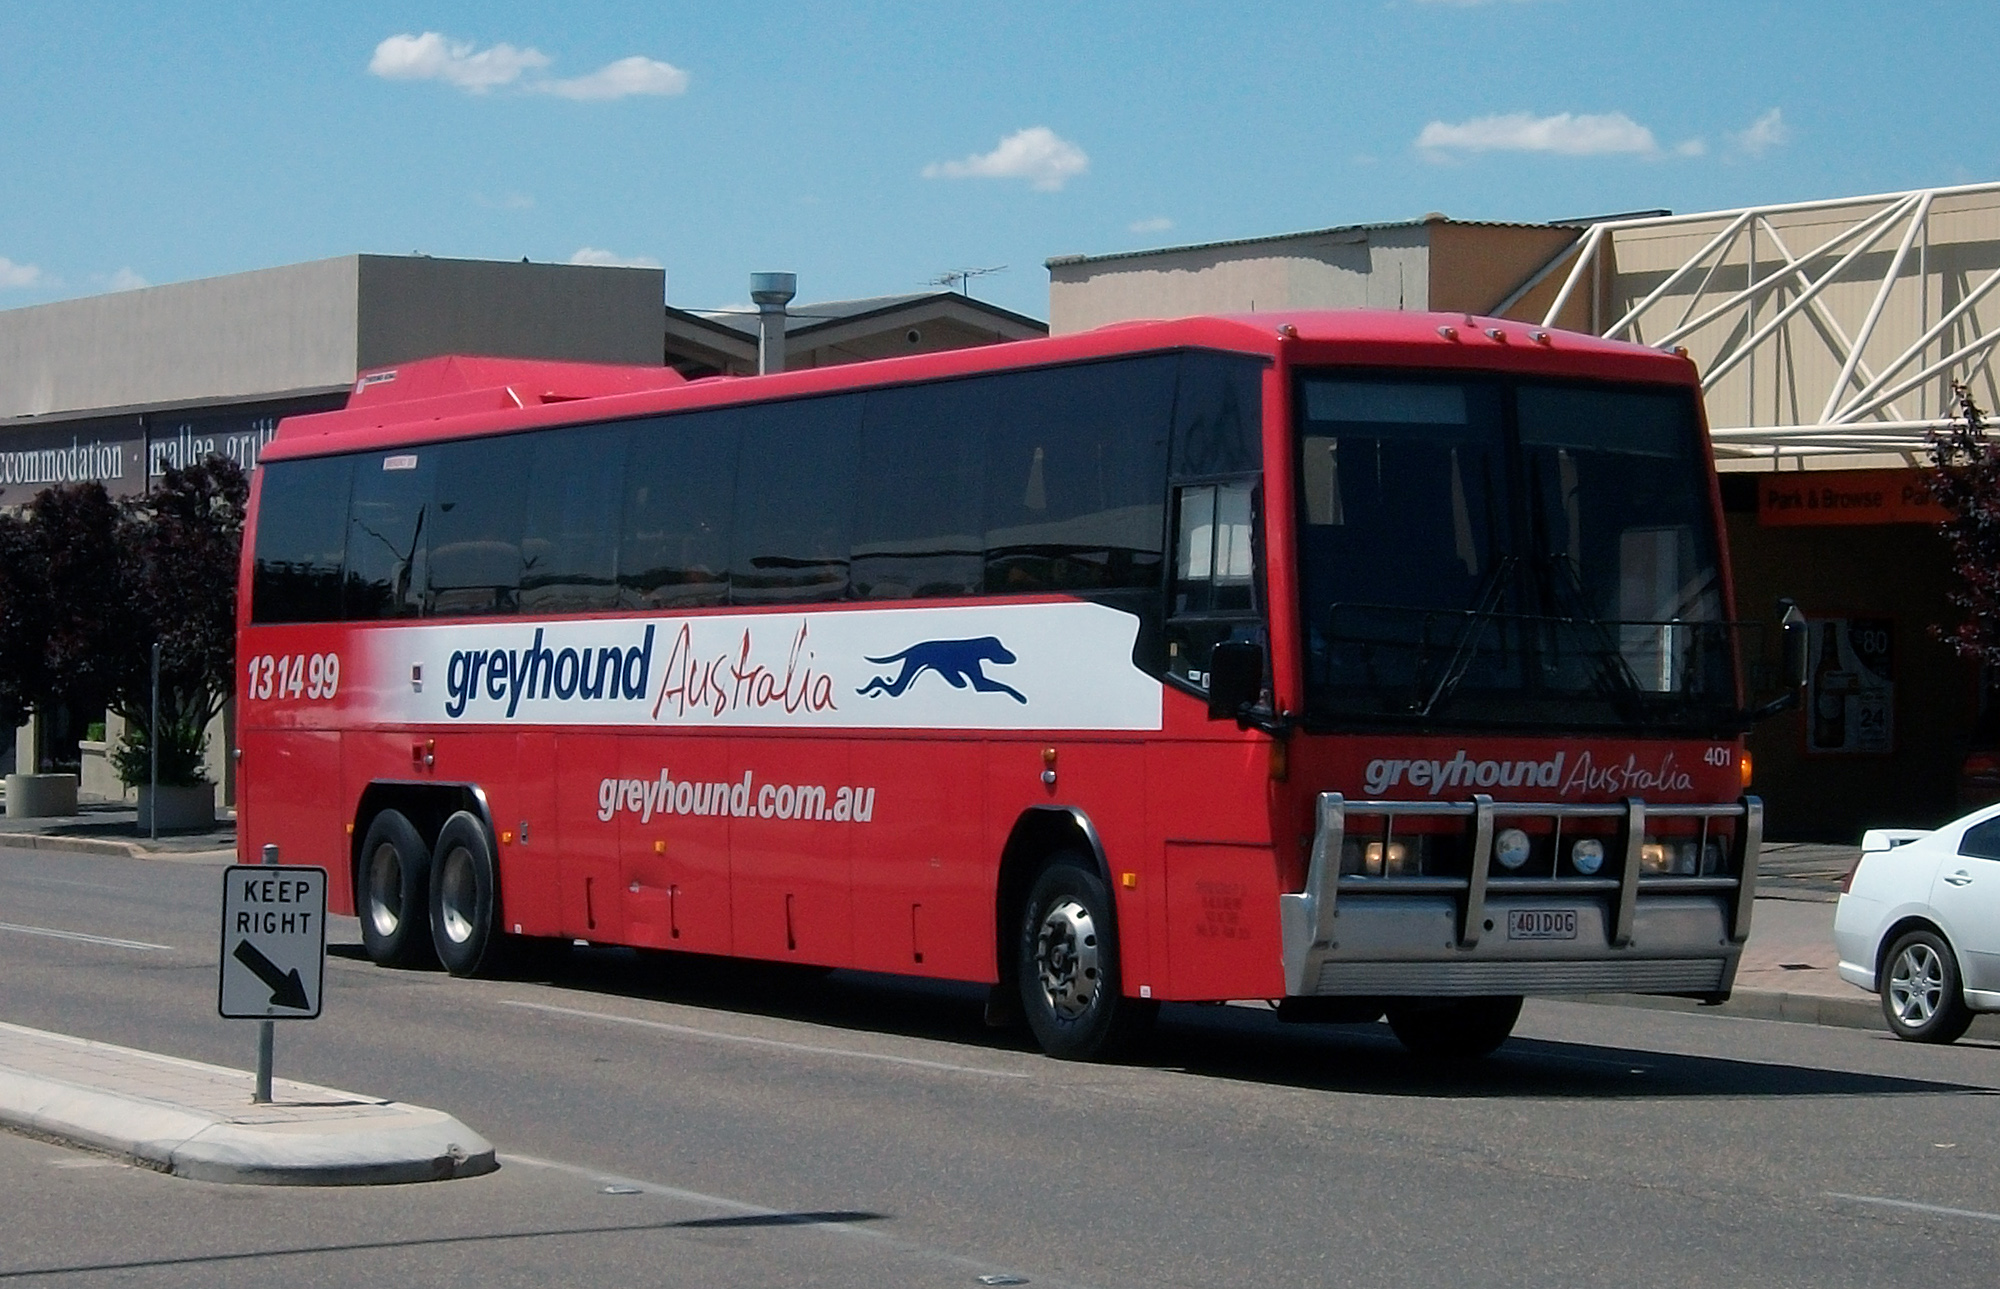 Bus Tours Australia And New Zealand